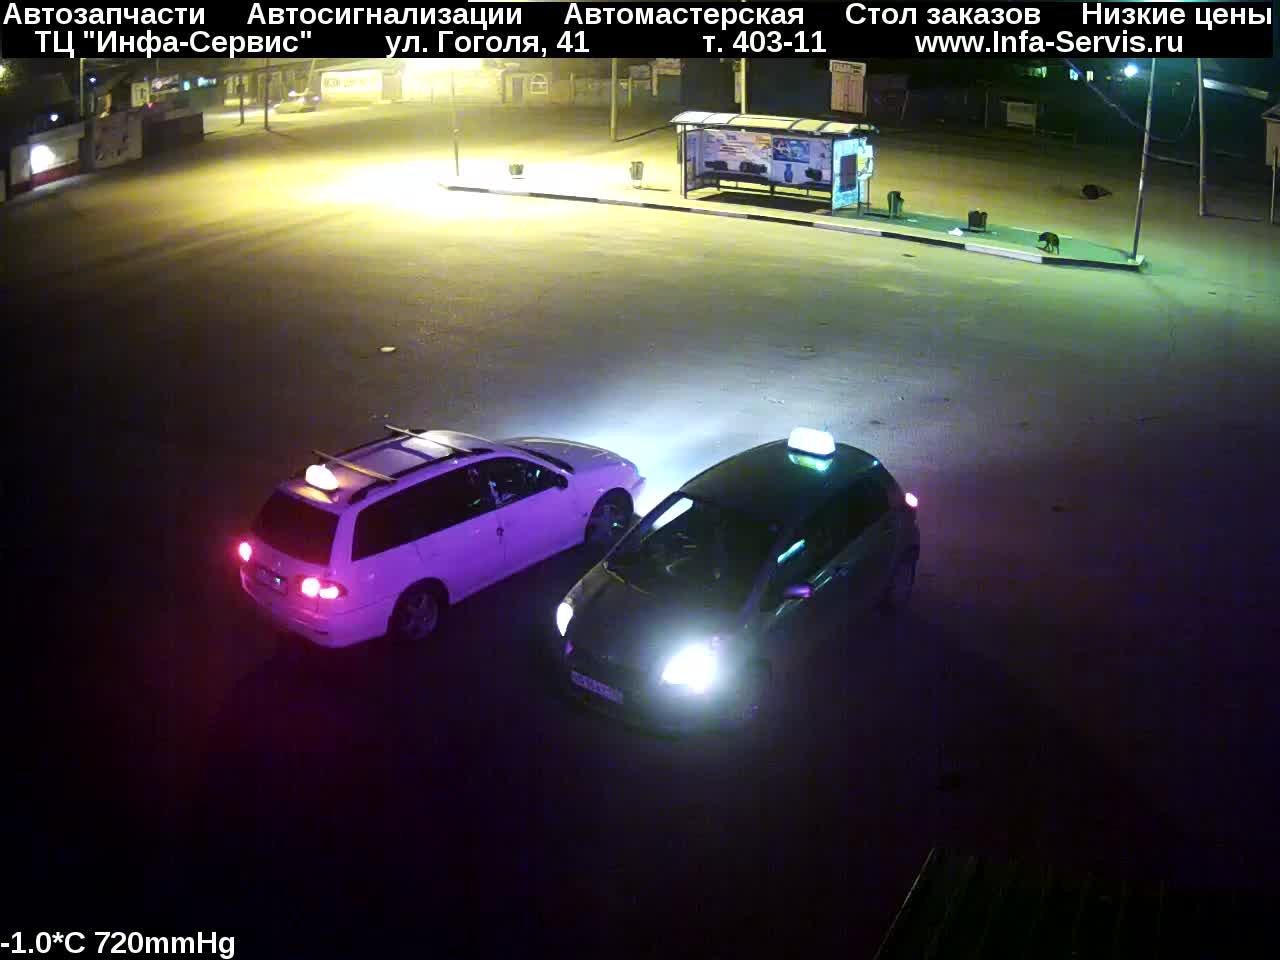 WEB-камера г.Тулун, Автостанция